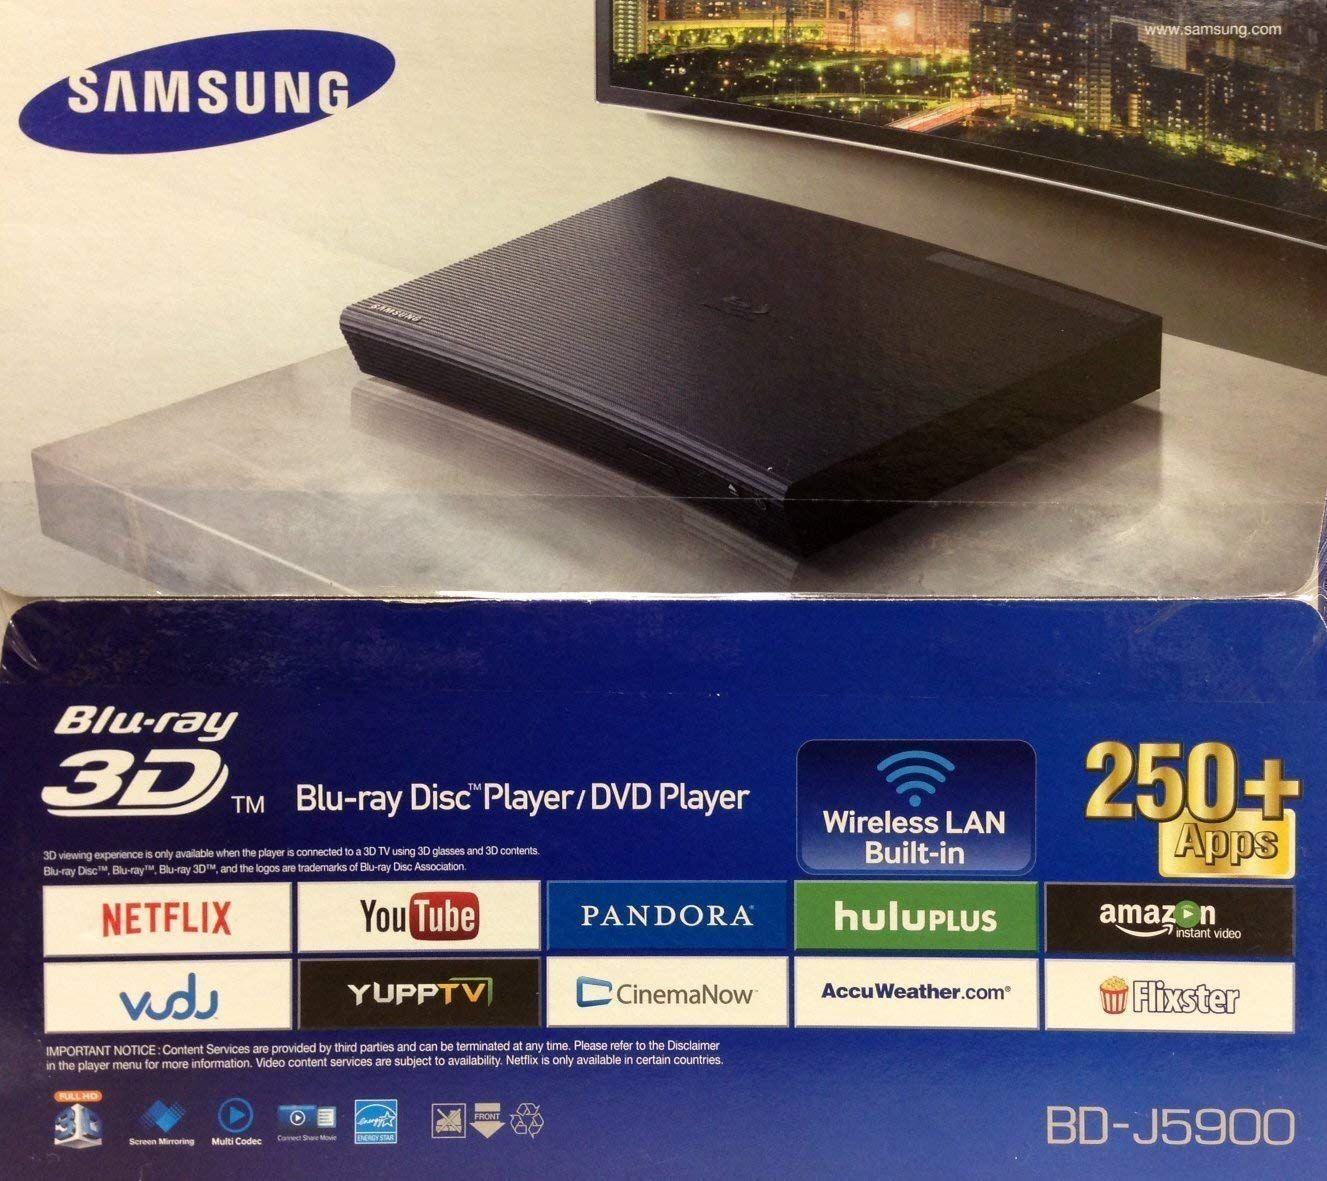 88d679f9057b30e48baa0478f73998e5 - How To Get A Blu Ray Disc To Play